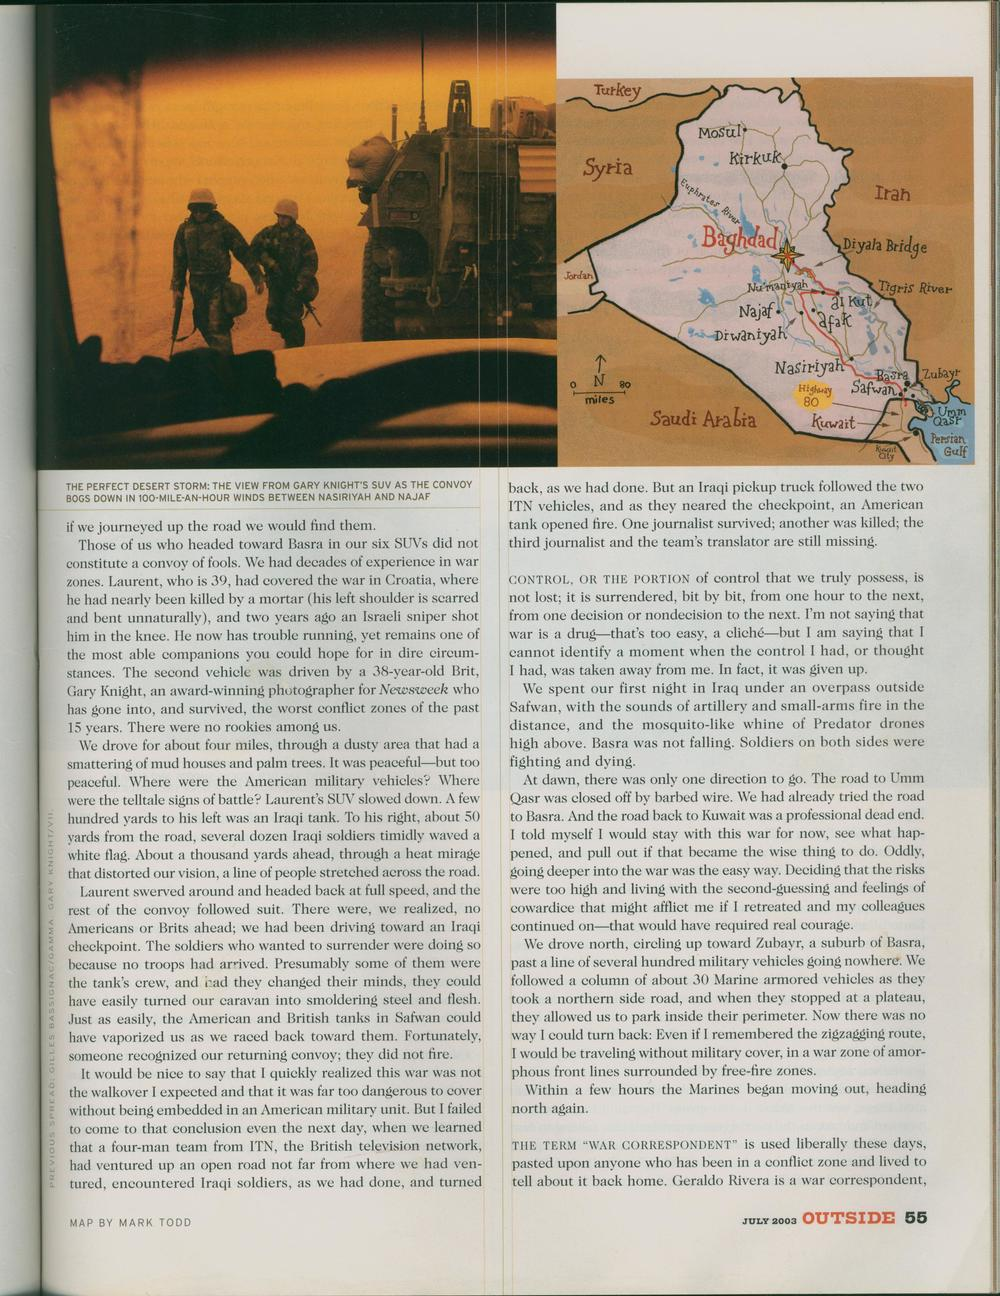 072003_OUTSIDE_IRAQ_0003.jpg